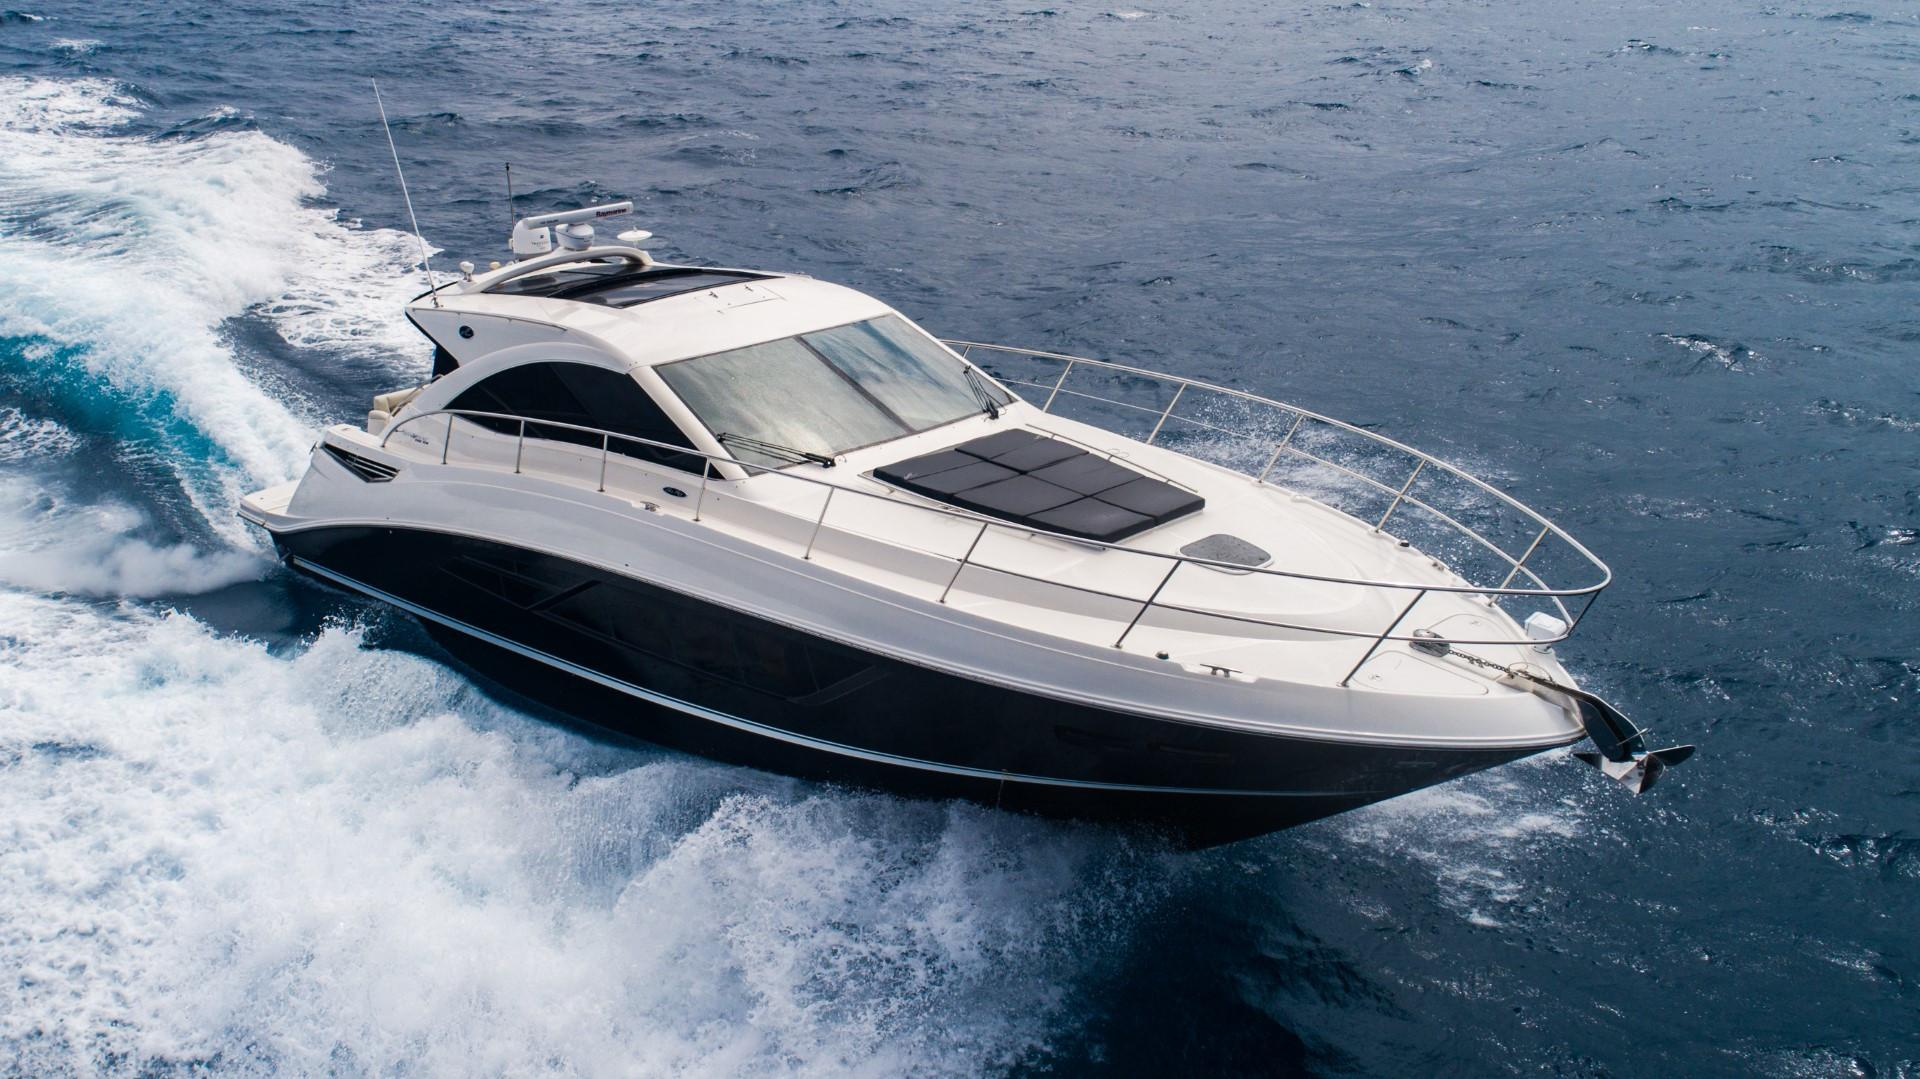 Beba Ii Yacht For Sale 51 Sea Ray Yachts Pompano Beach Fl Denison Yacht Sales